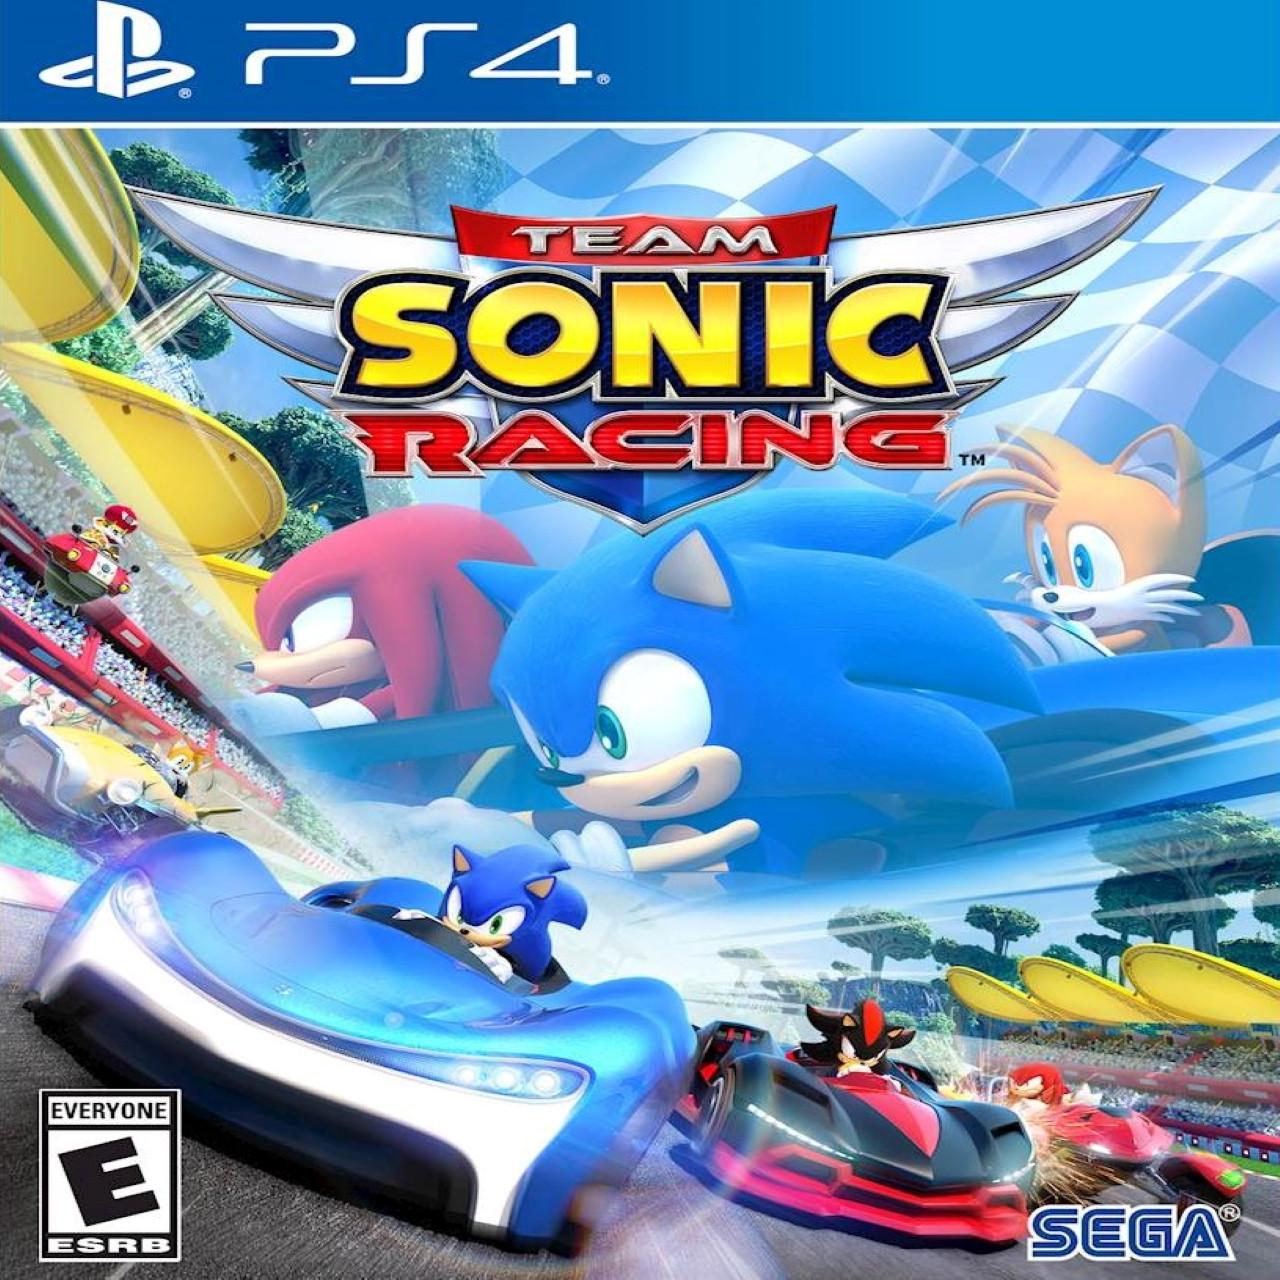 Sonic Team Racing PS4 RUS